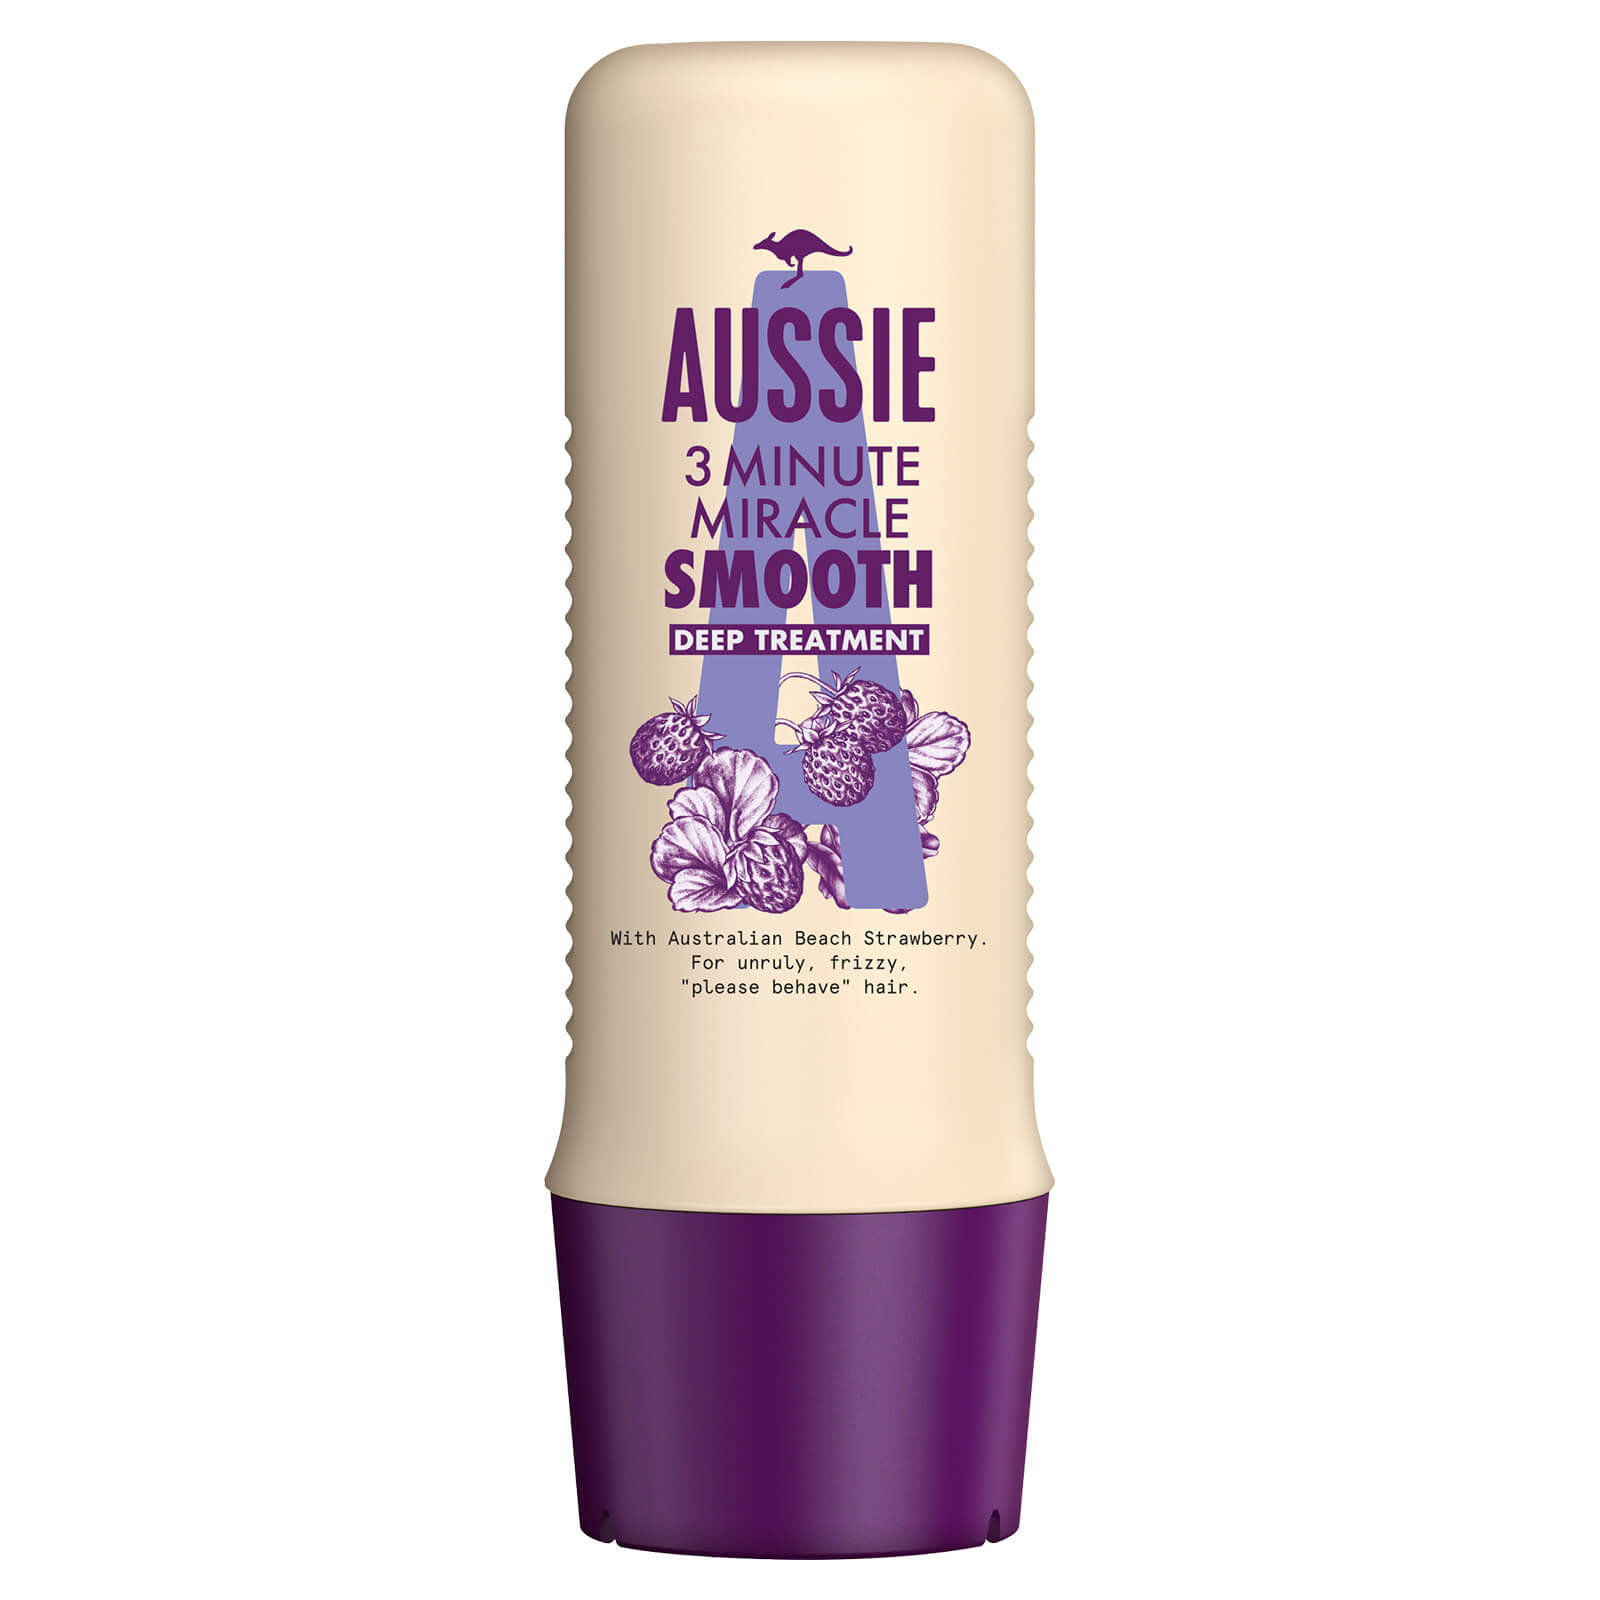 Купить Aussie 3 Minute Miracle Scent-Sational Smooth Hair Conditioner Treatment 250ml